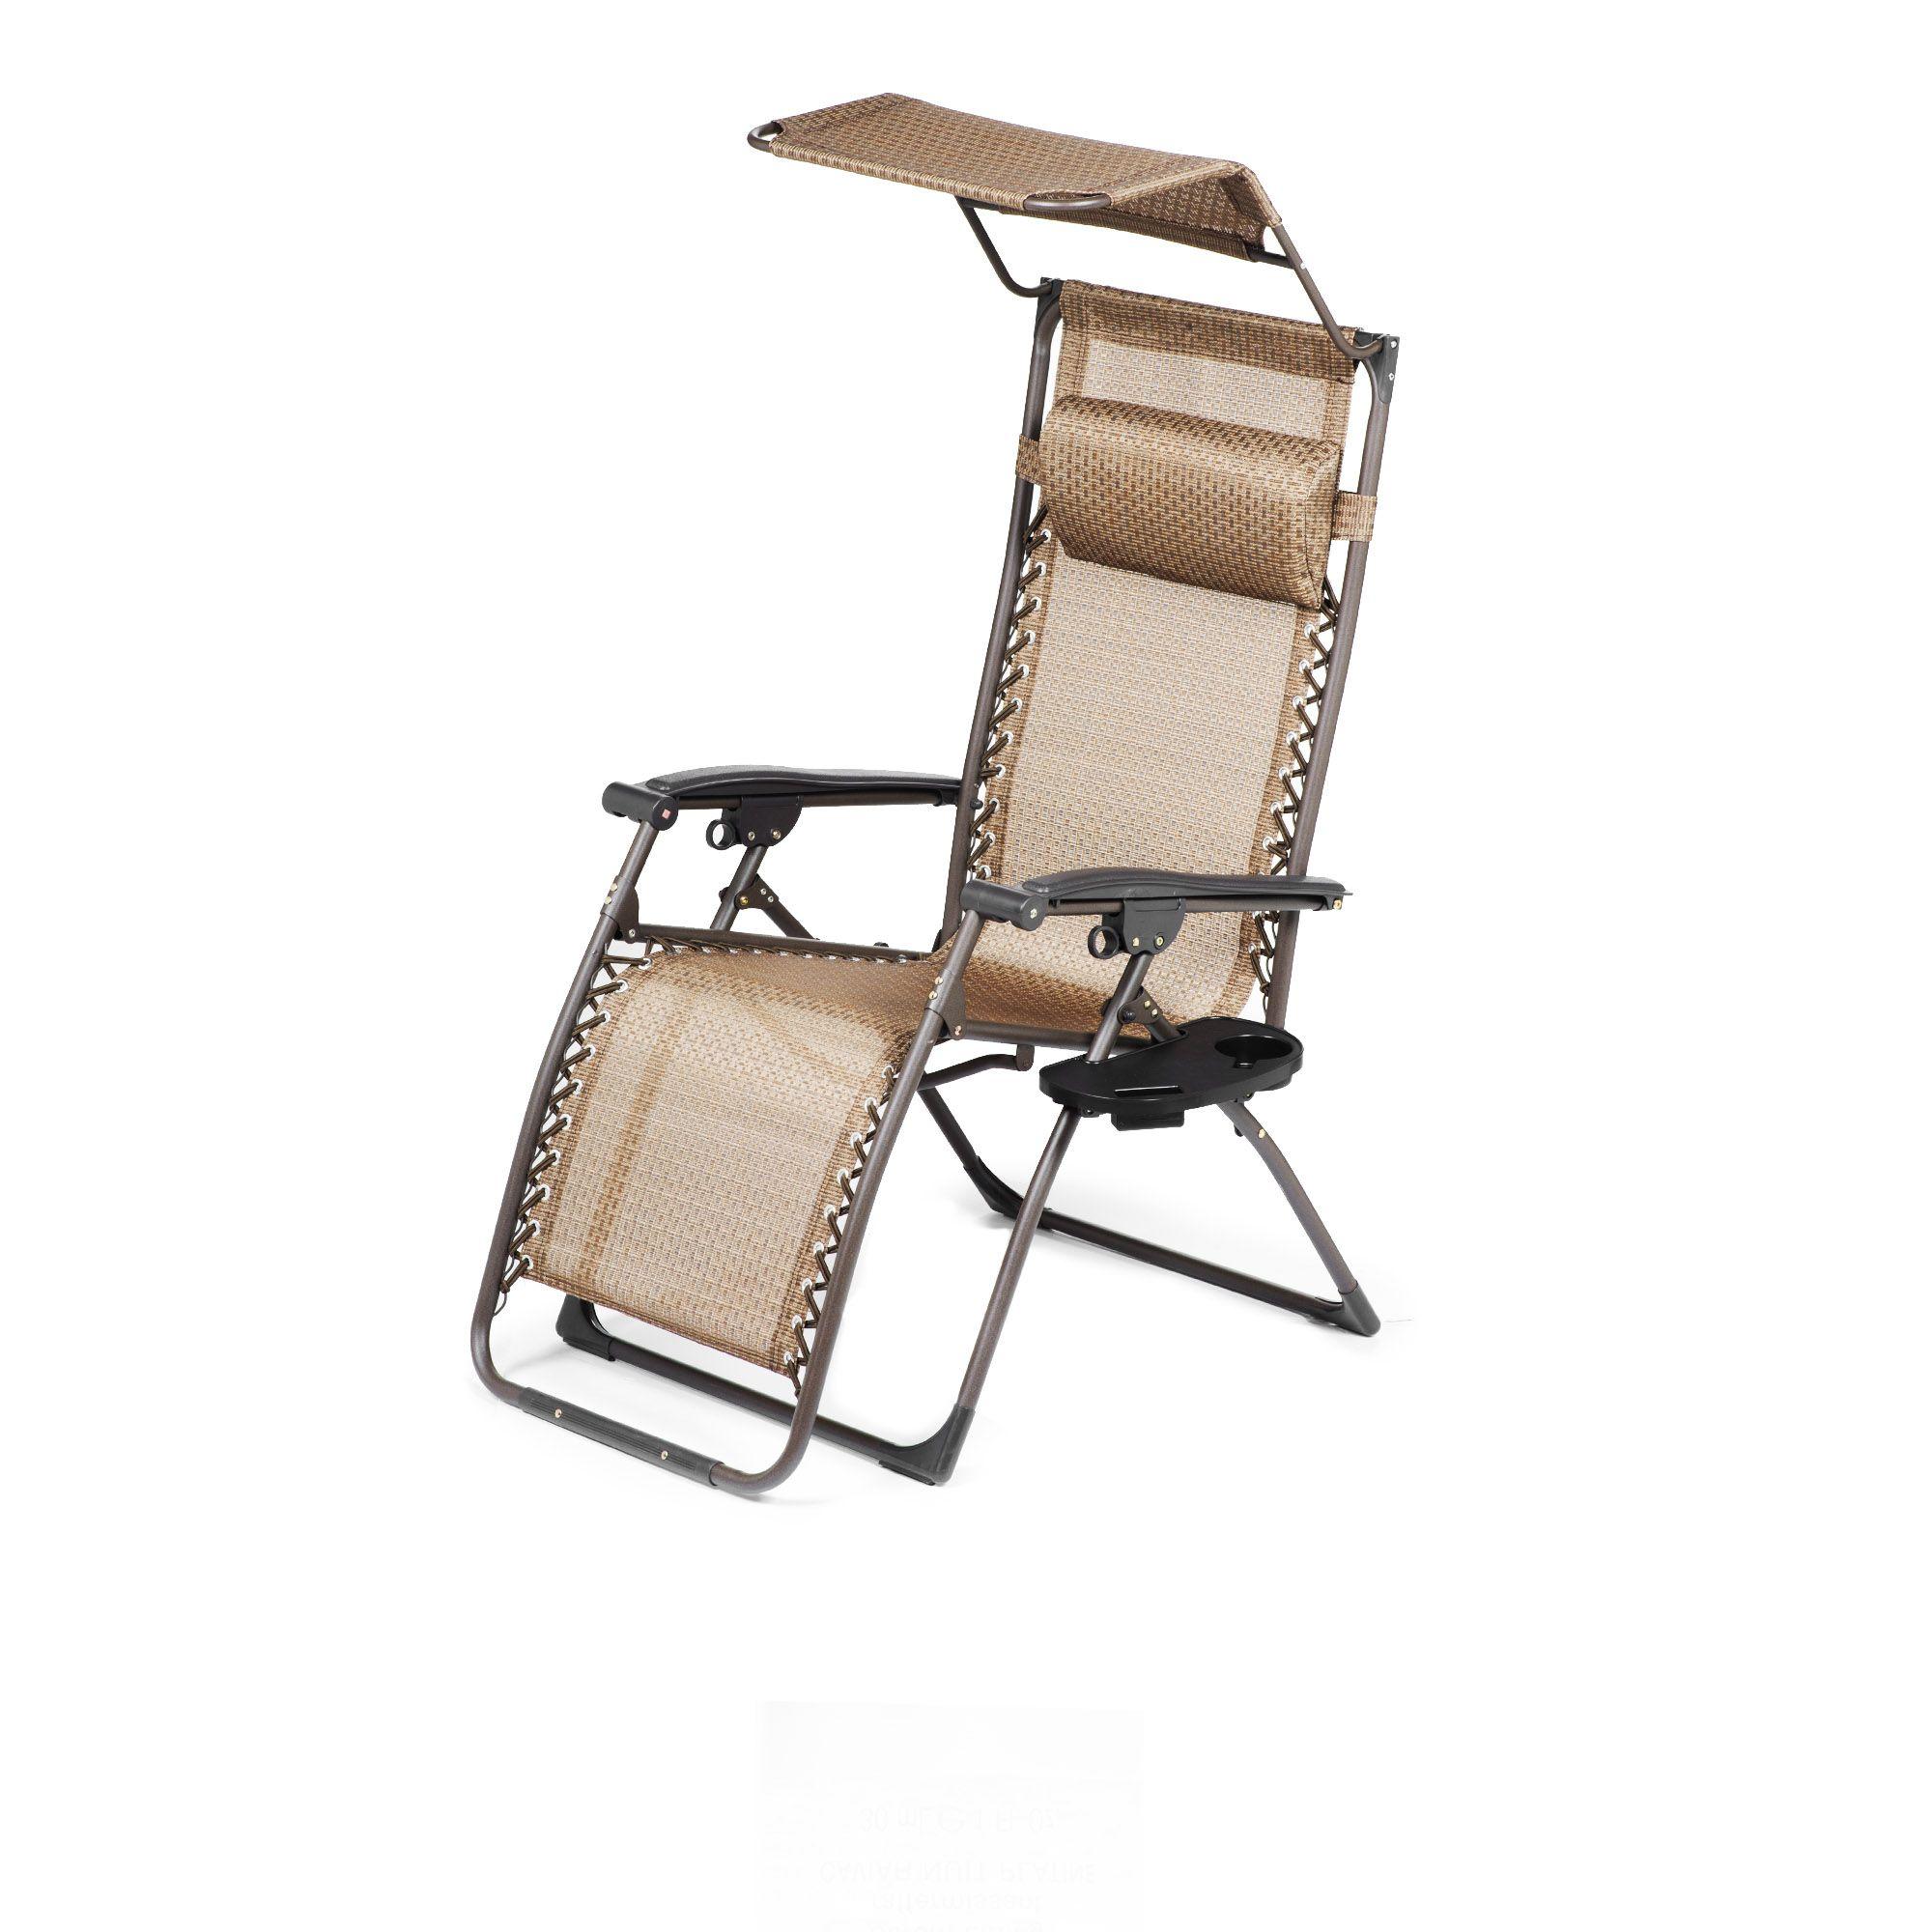 Sedia a sdraio reclinabile da giardino qvc italia for Sedia a dondolo reclinabile